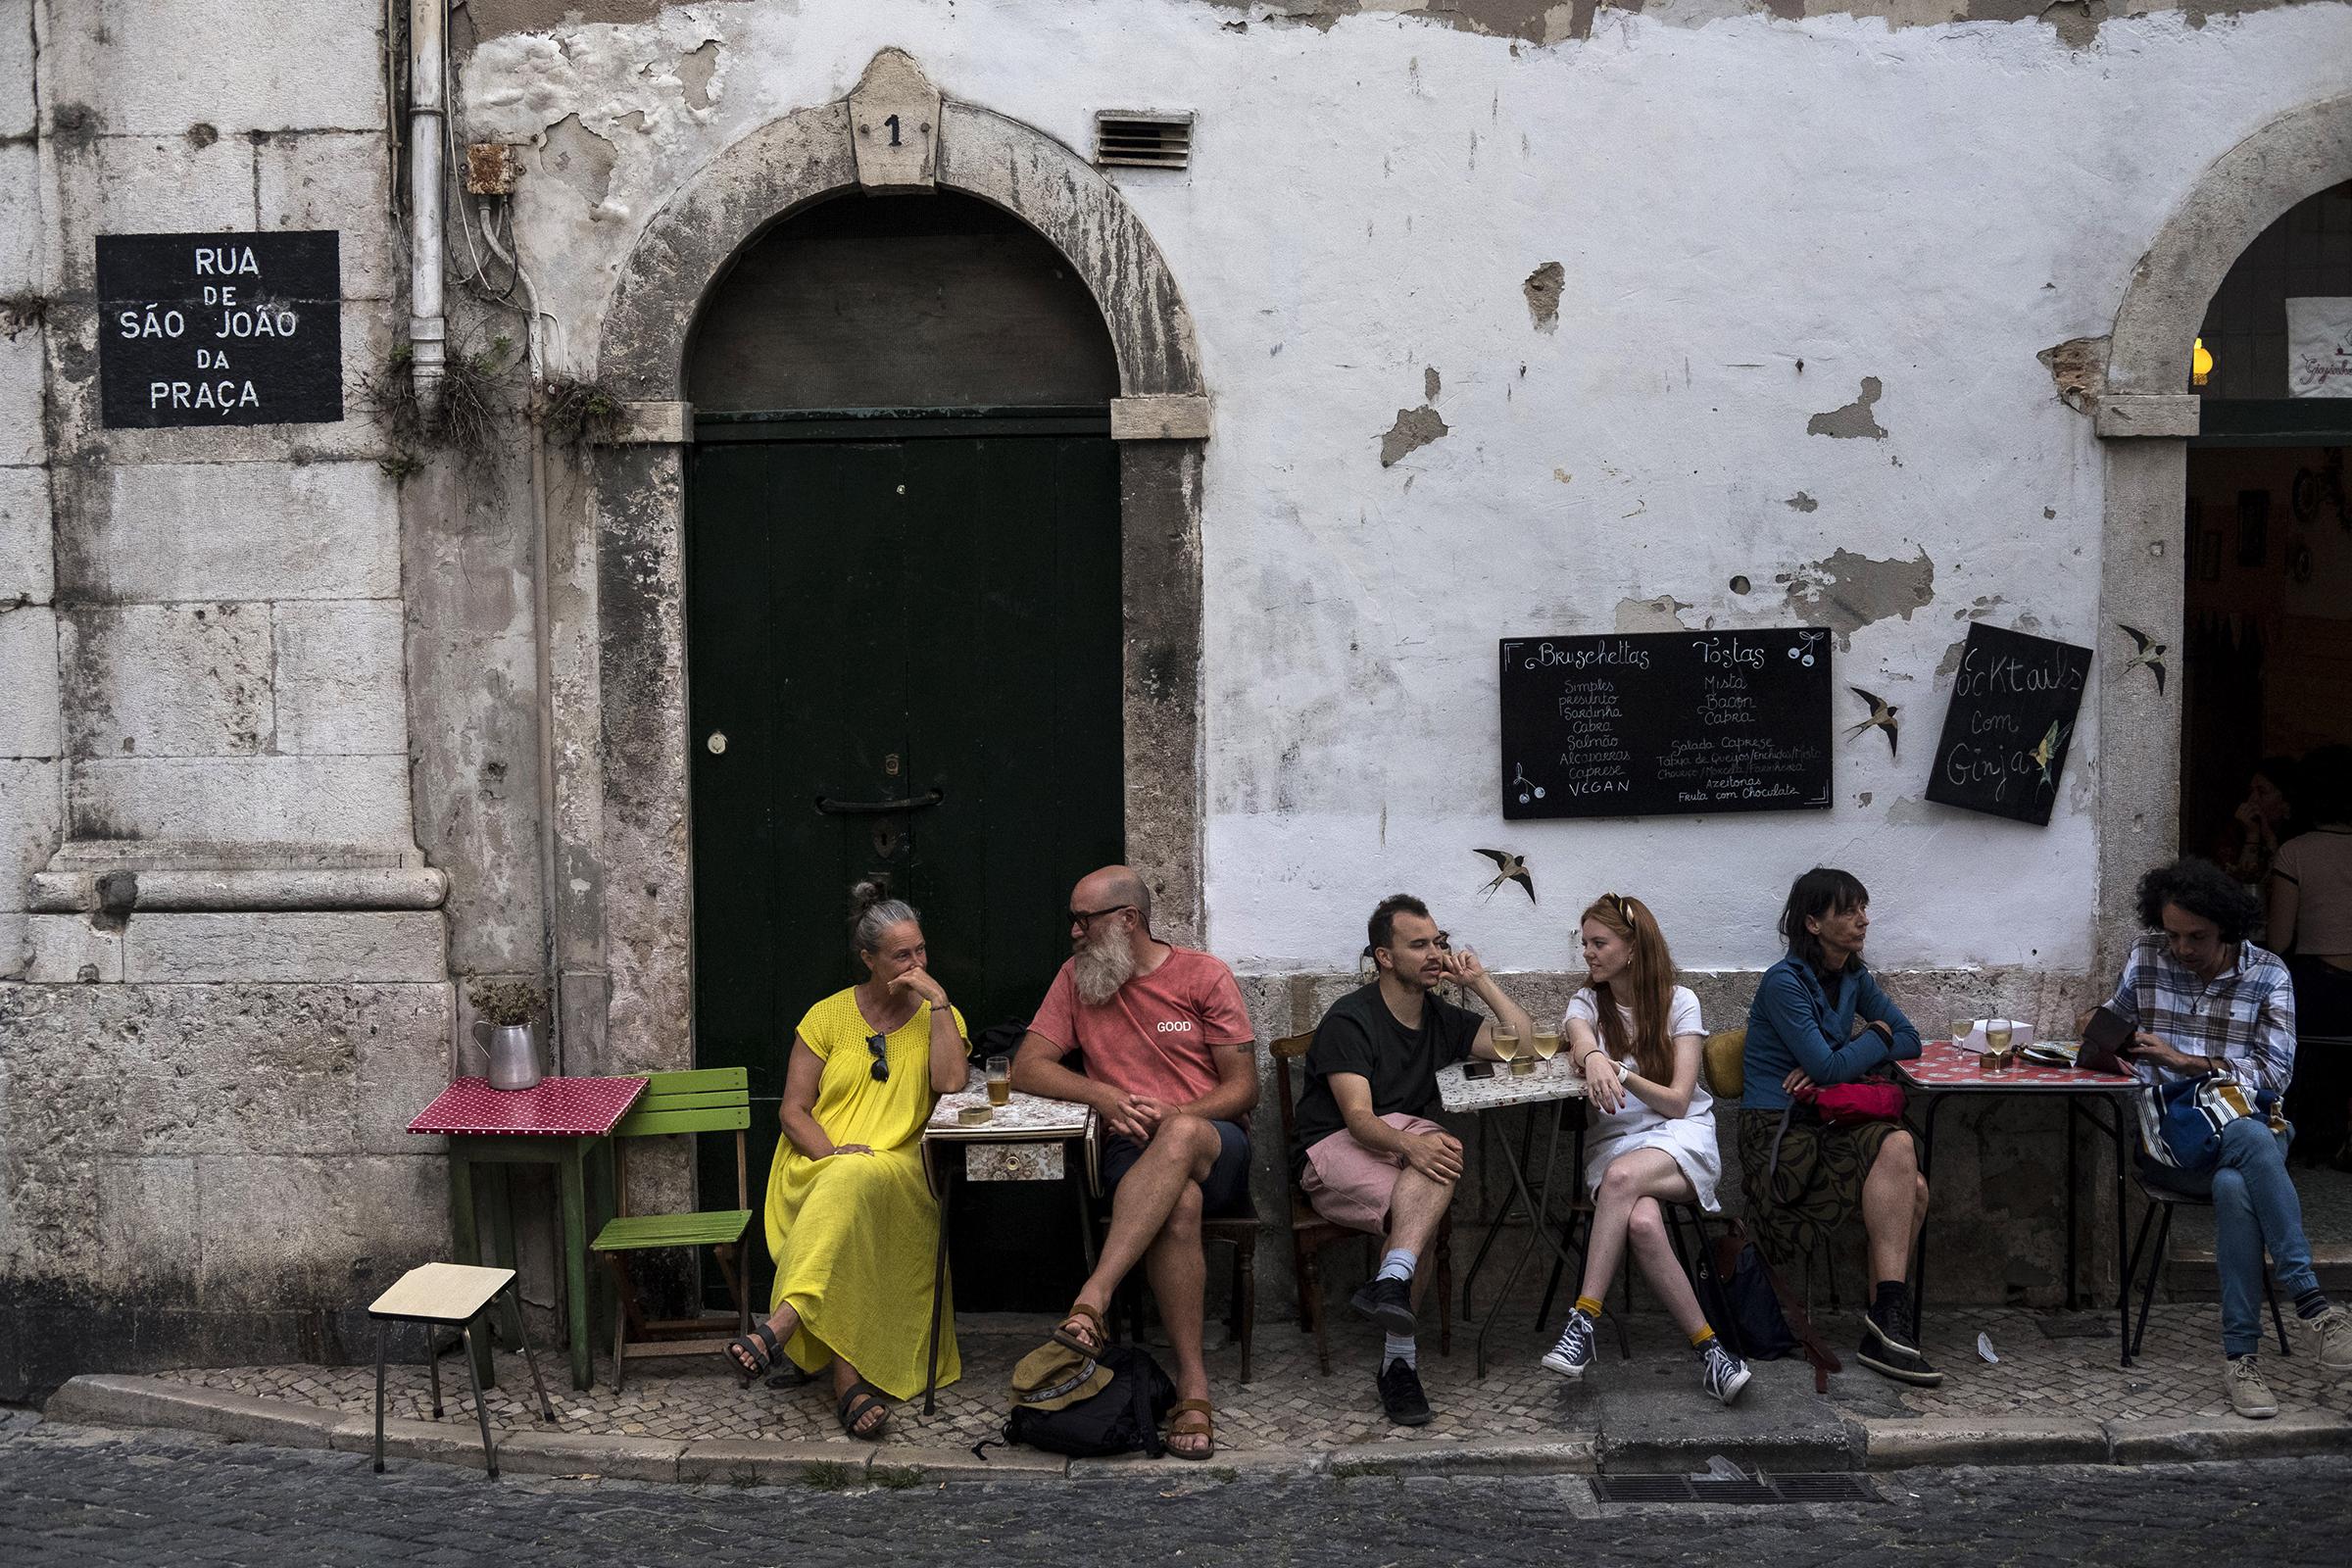 A street in the Alfama neighborhood of Lisbon, Portugal, on Sept. 28, 2019.